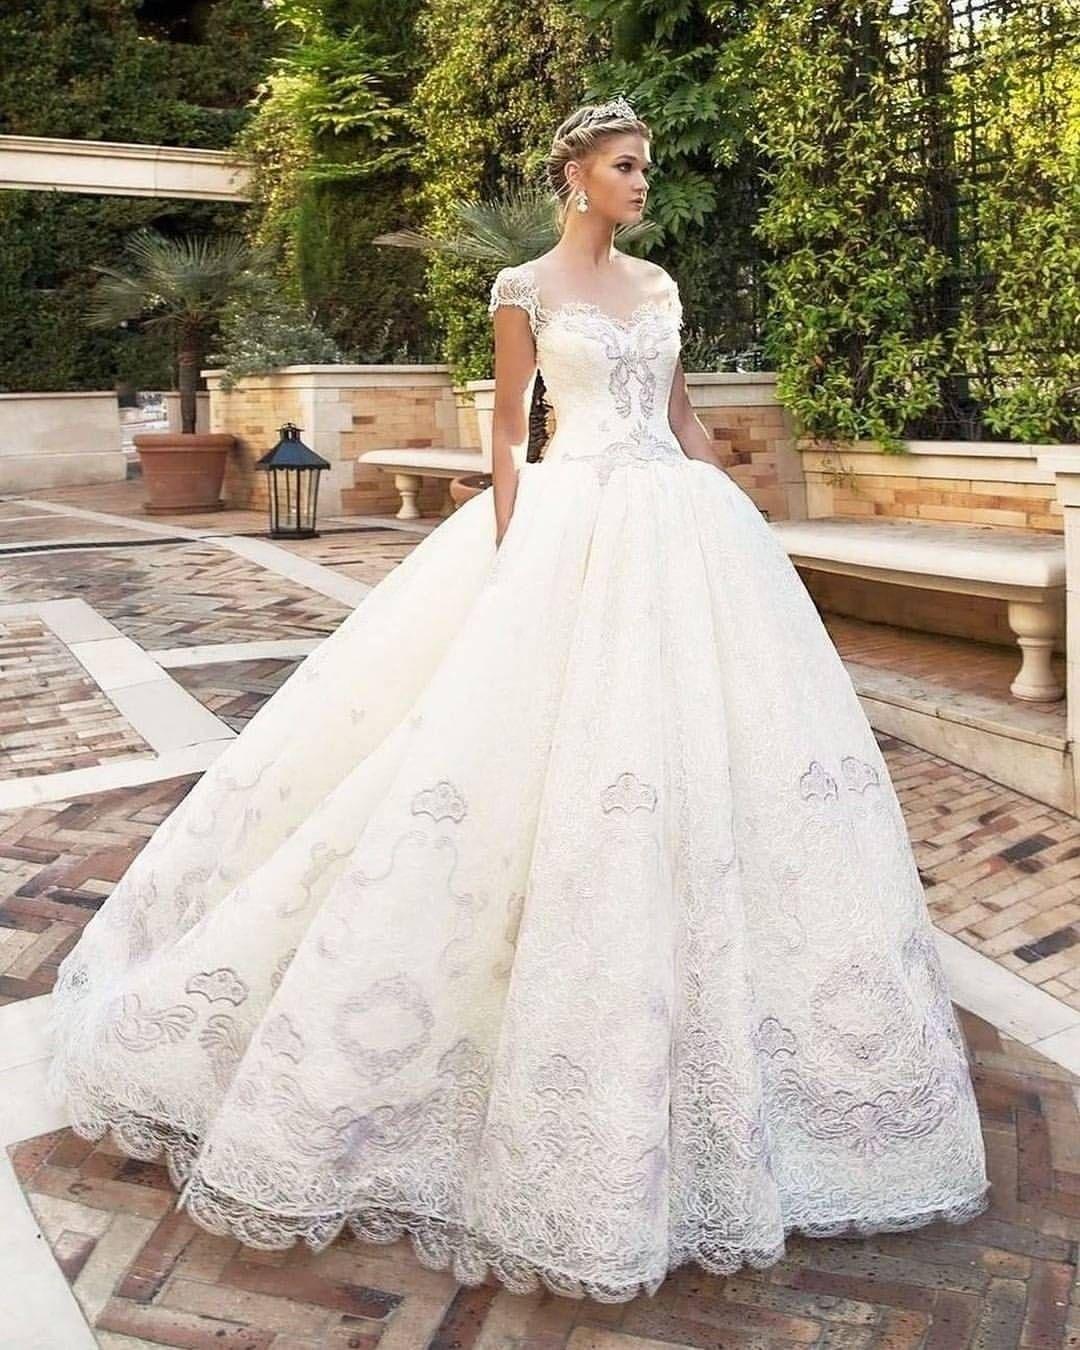 Catholic wedding dresses  See this Instagram photo by thewedlist u  likes  Style Ideas